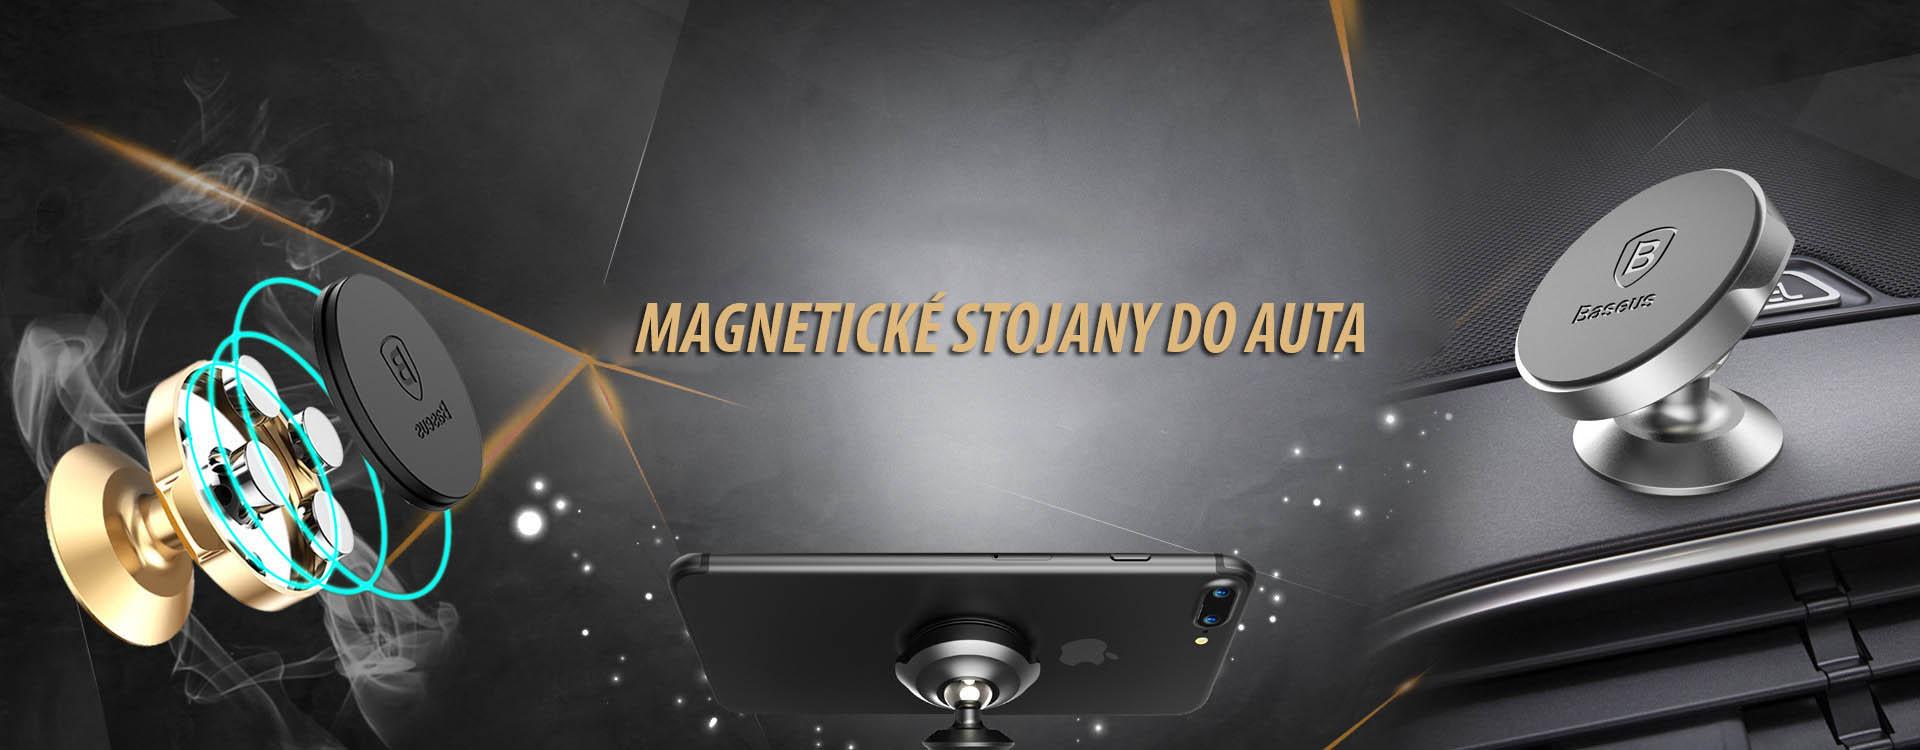 Magnetické stojany do auta na iPhone